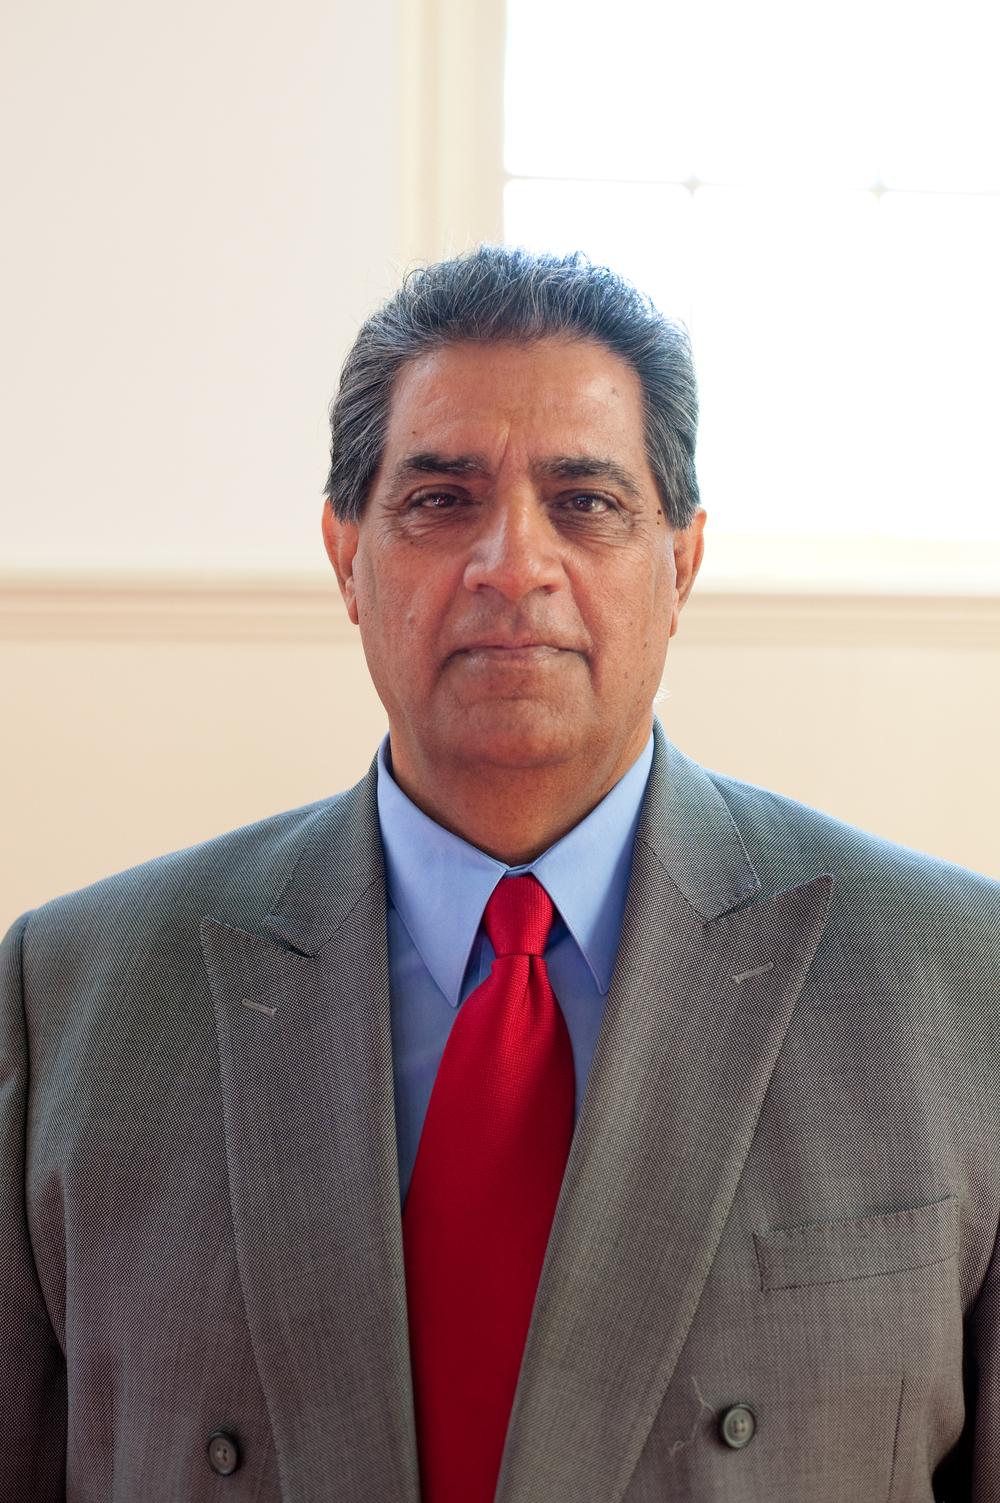 Pastor Asad Hashemi